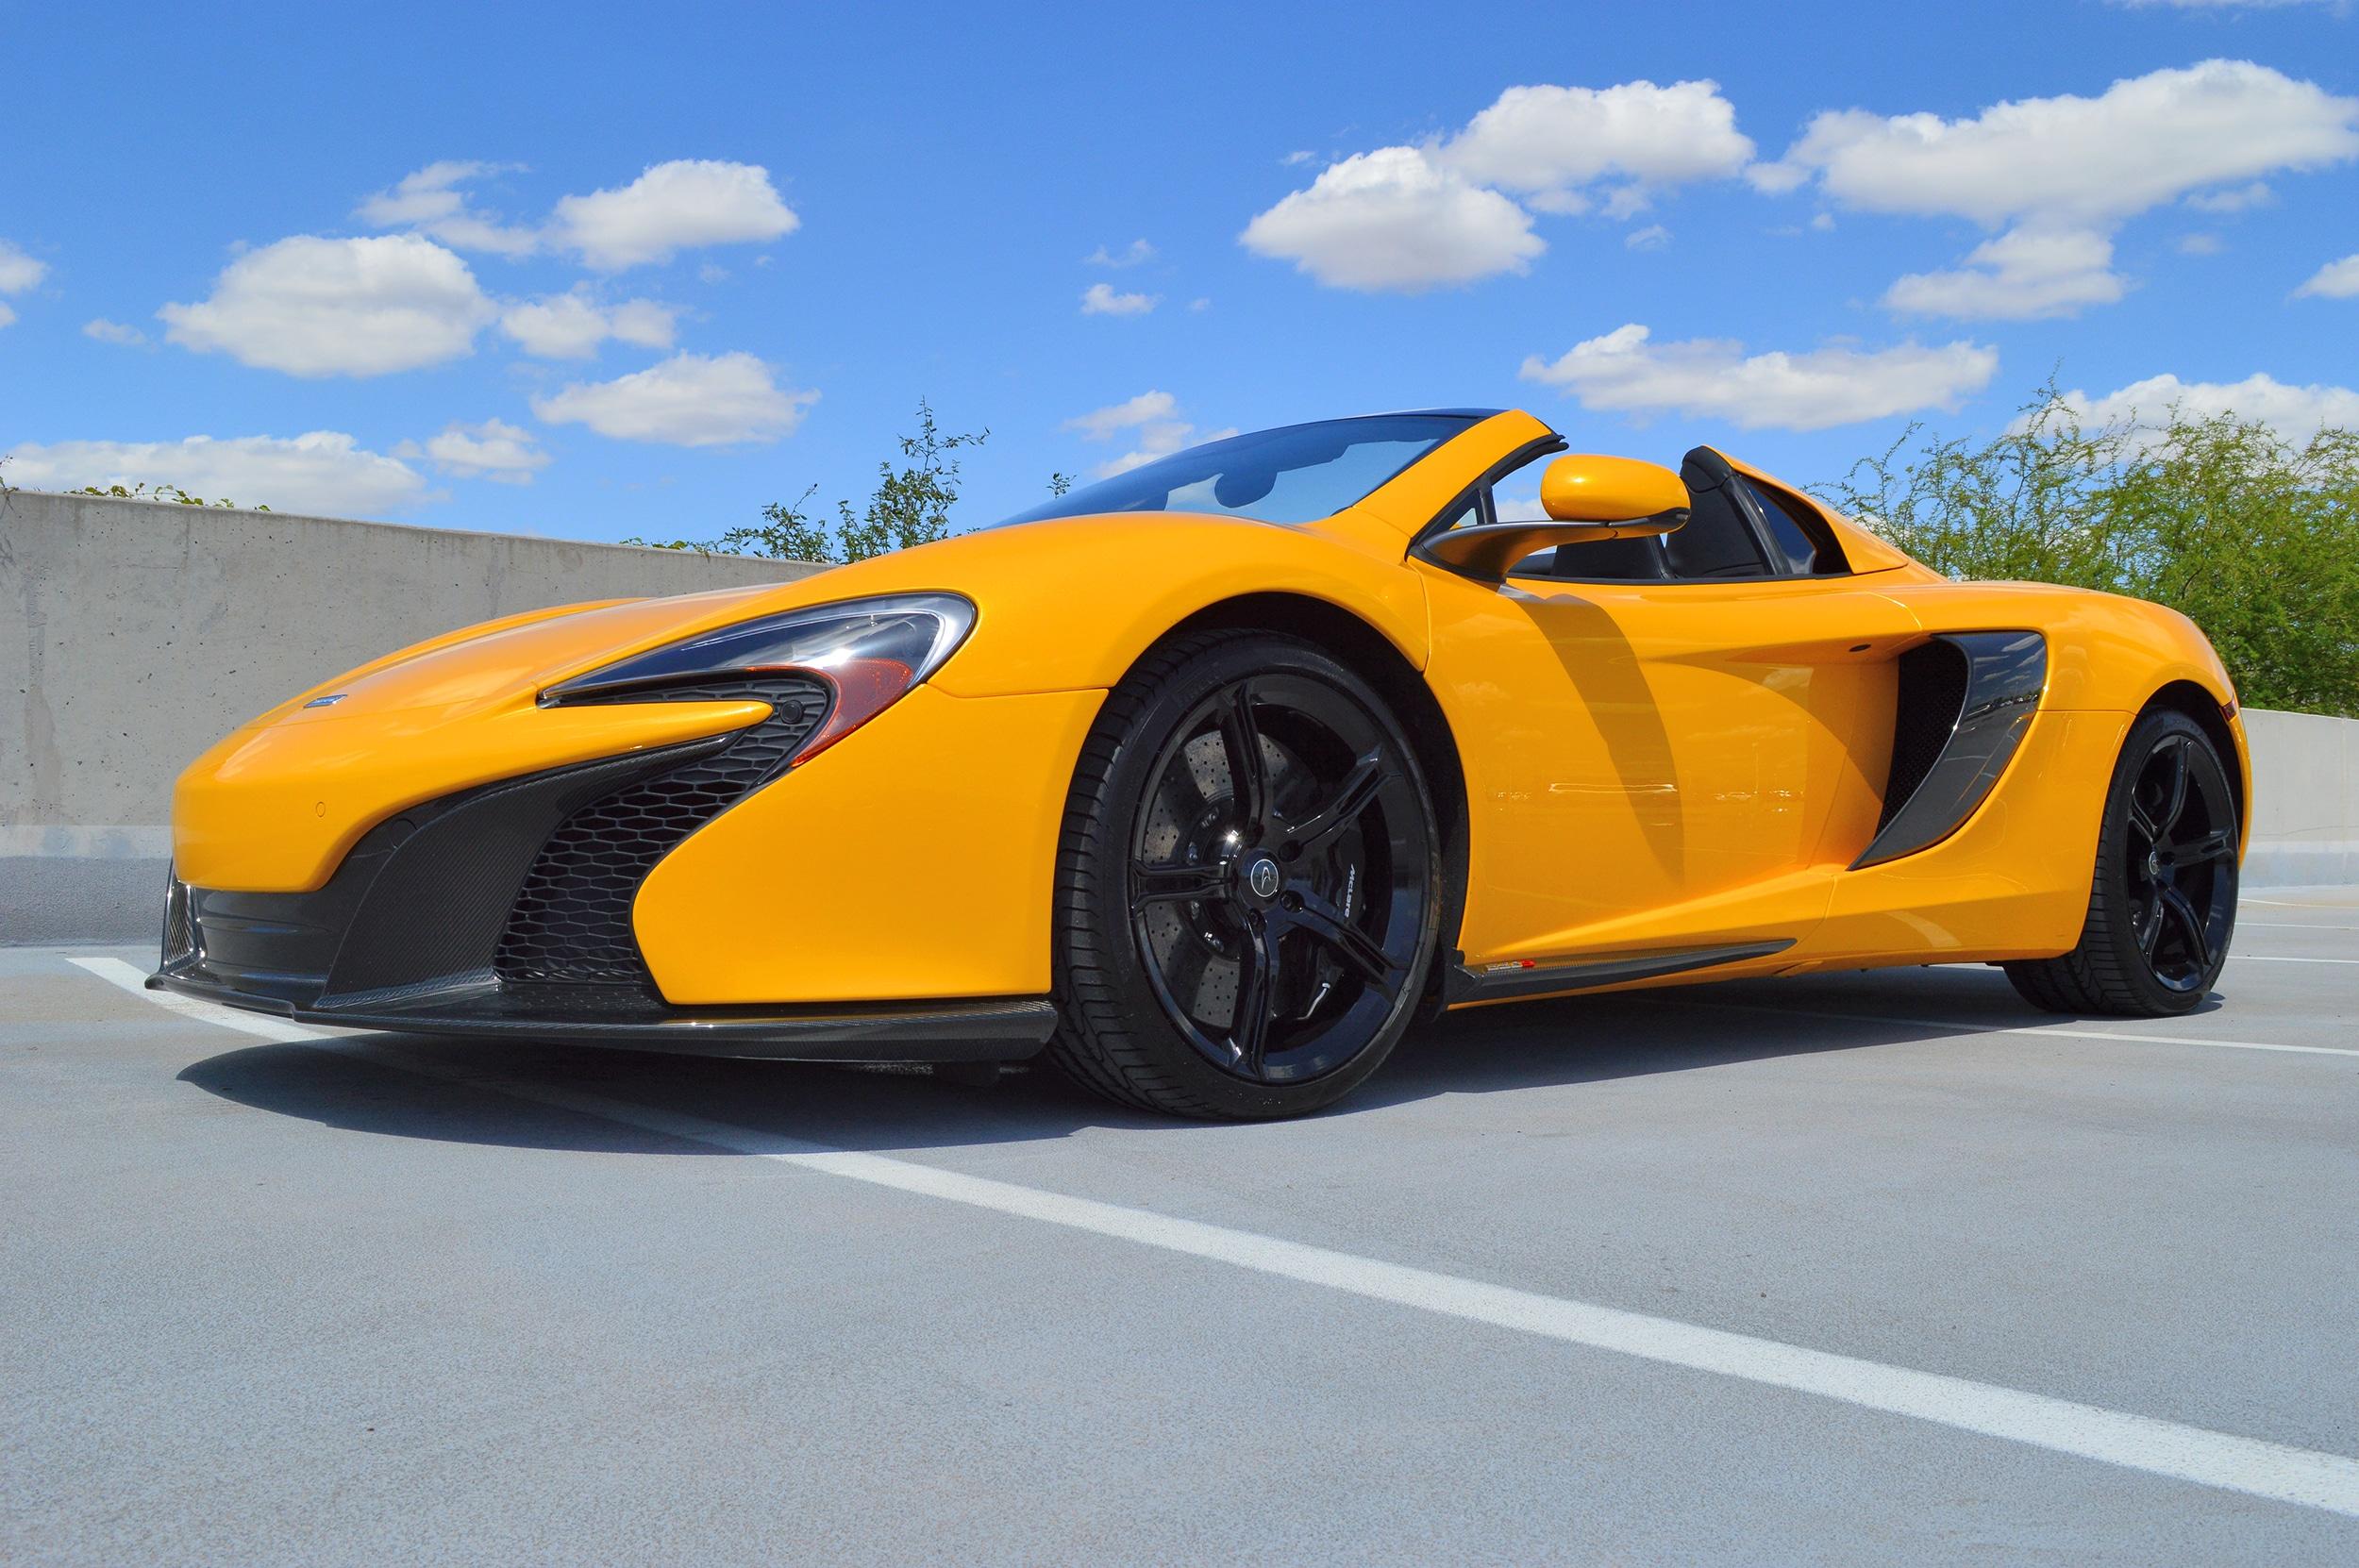 Photo Used 2015 McLaren 650S Spider Convertible For Sale Scottsdale, AZ